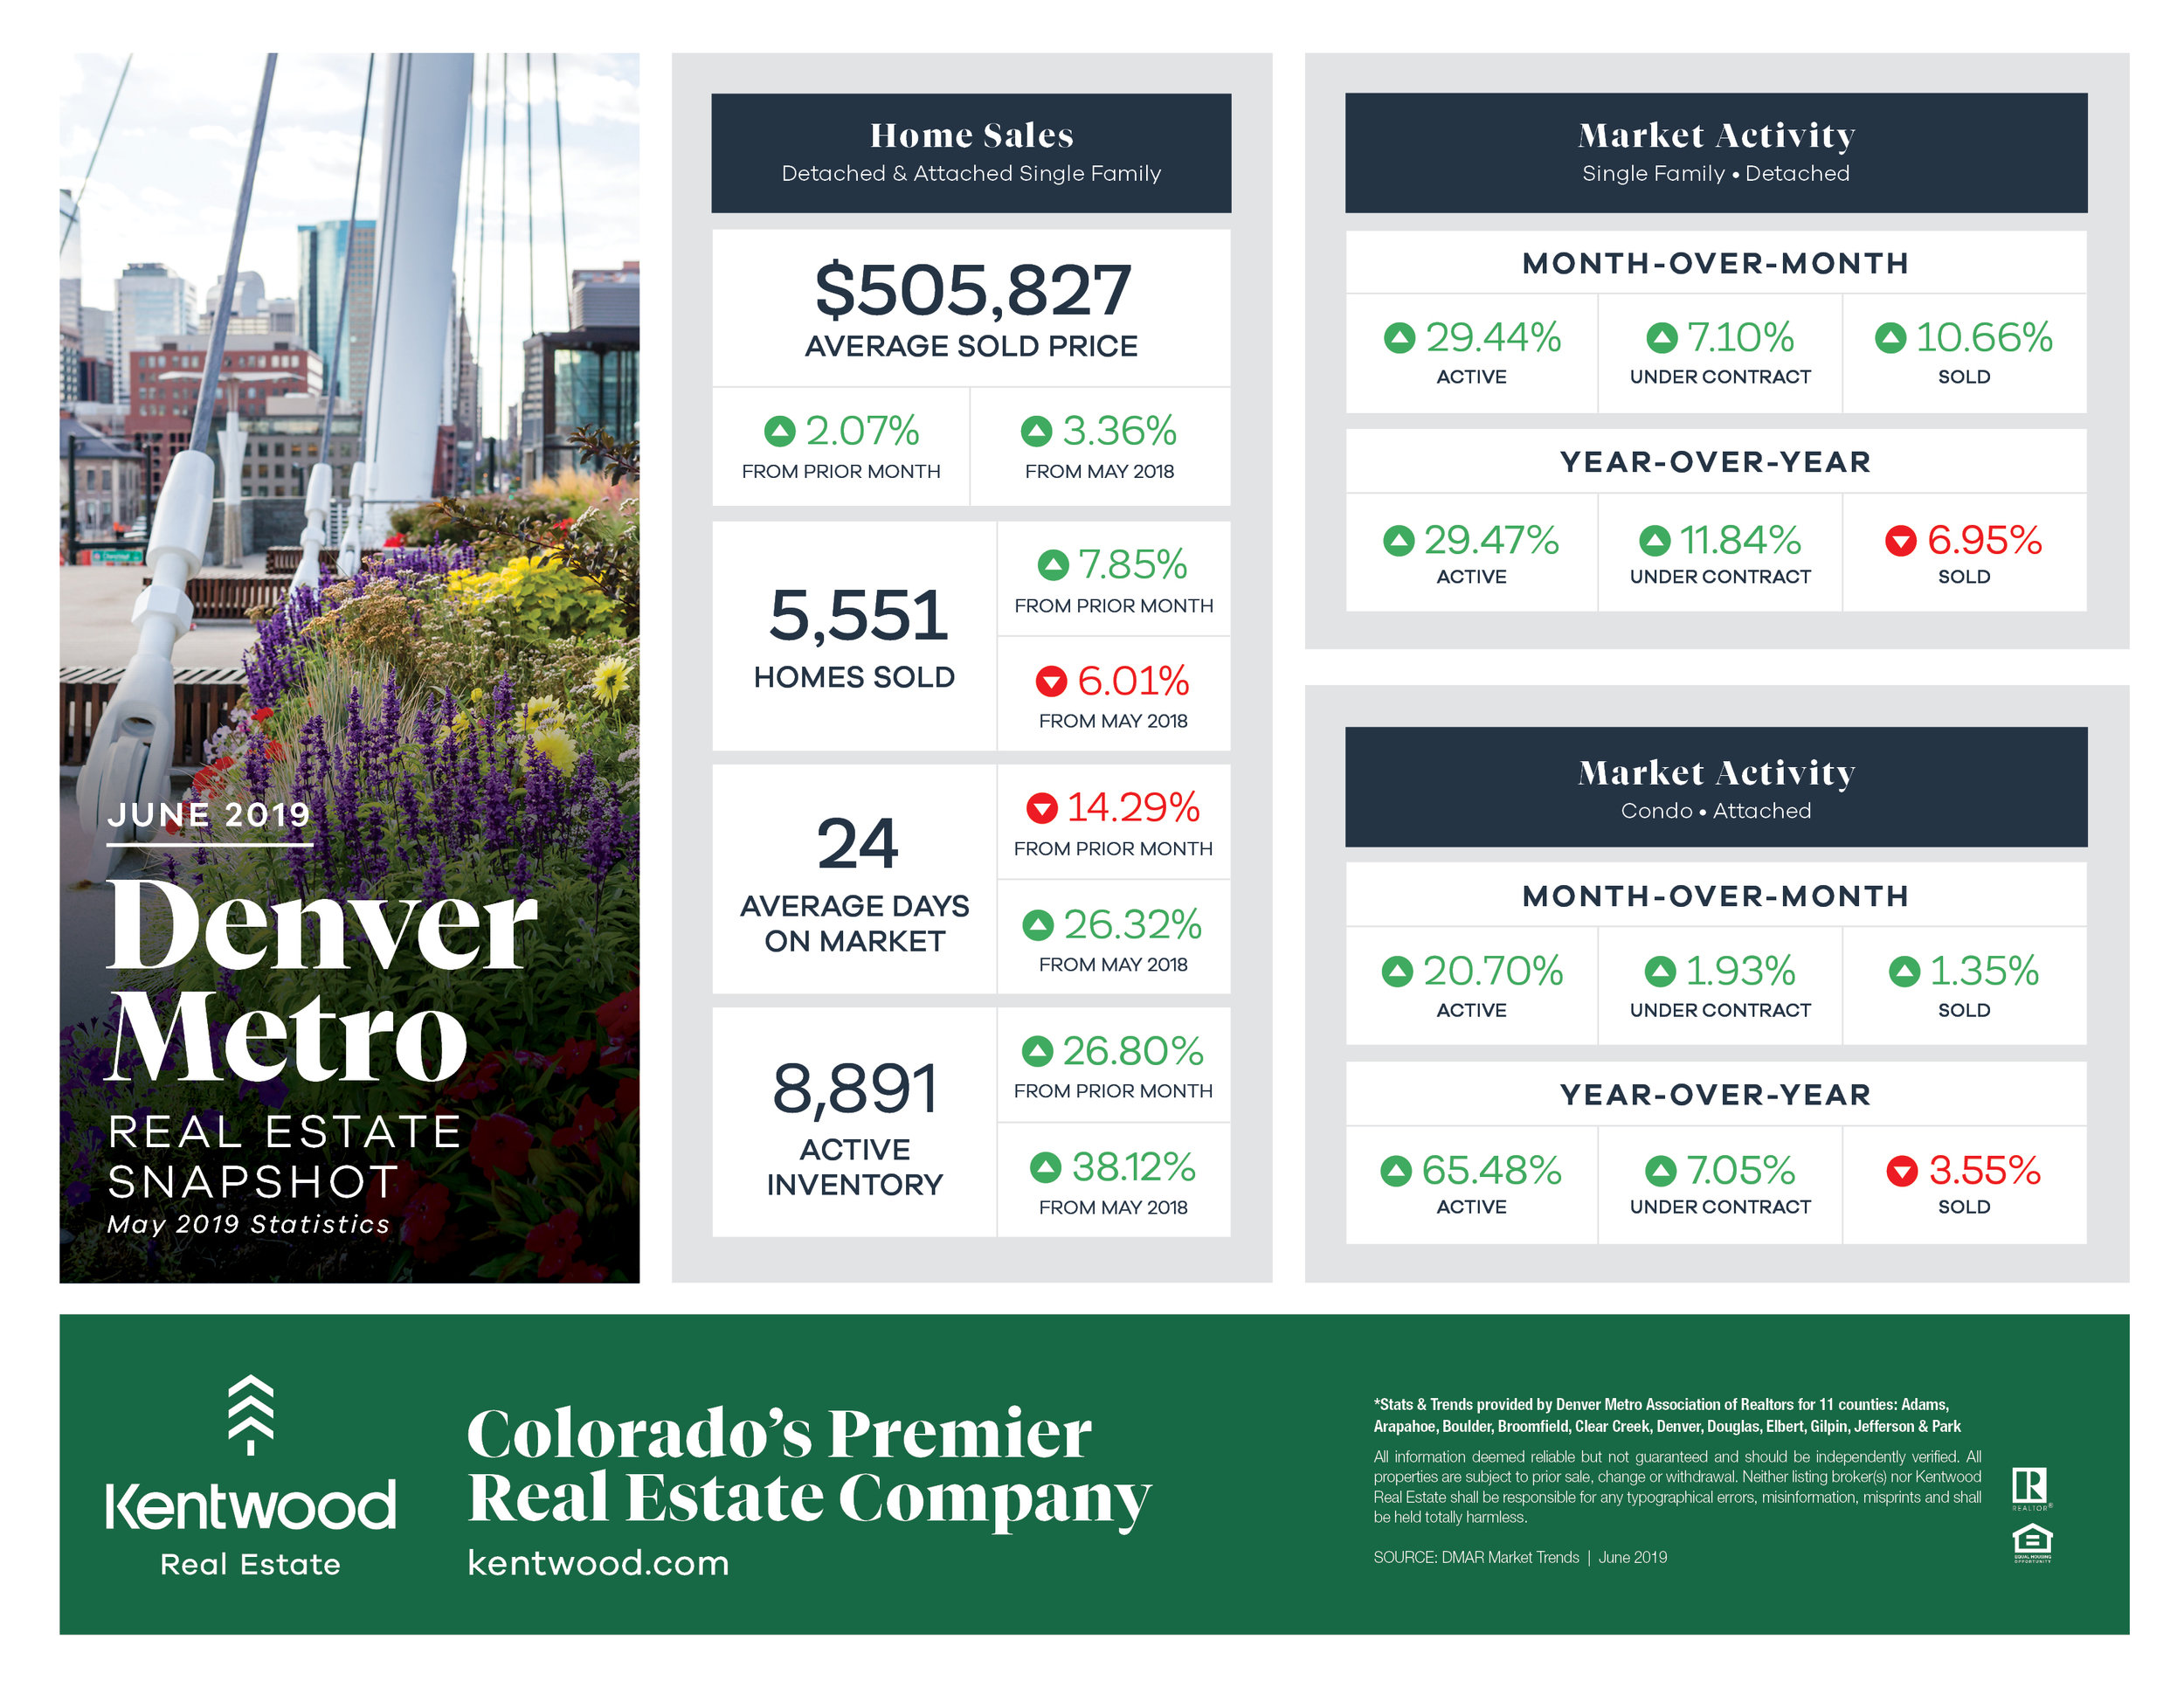 June_Denver_Metro_StatsUpdatedBranding (1).jpg